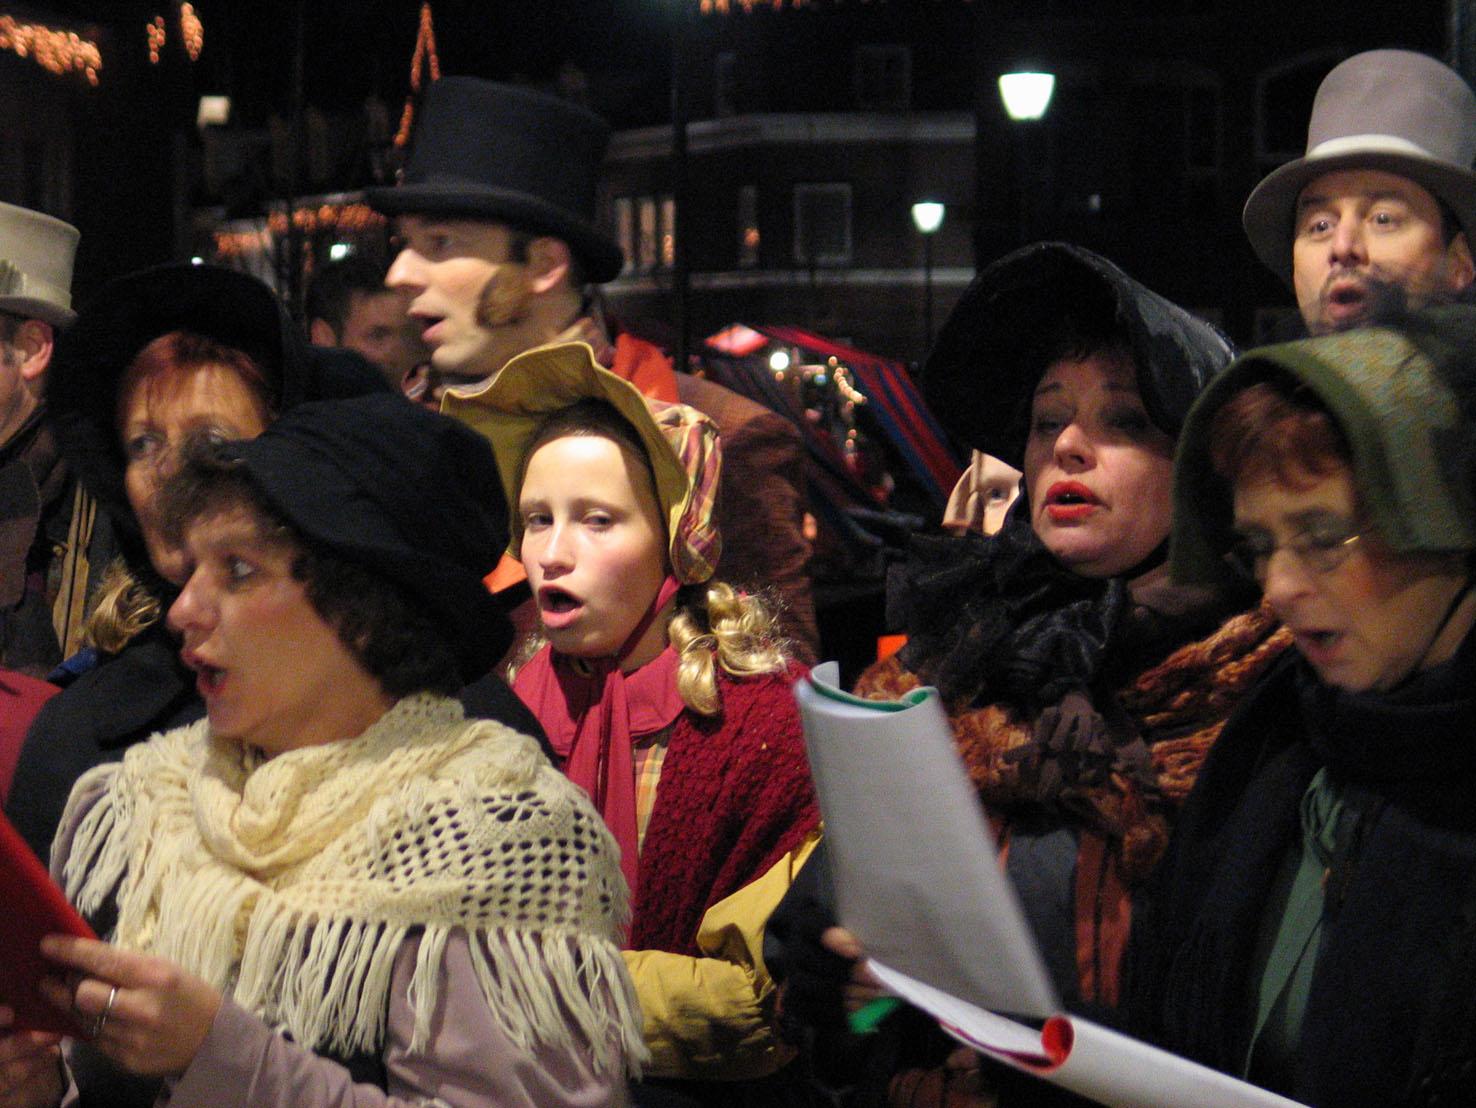 142 - Kerstmarkt Helmond 2003.jpg